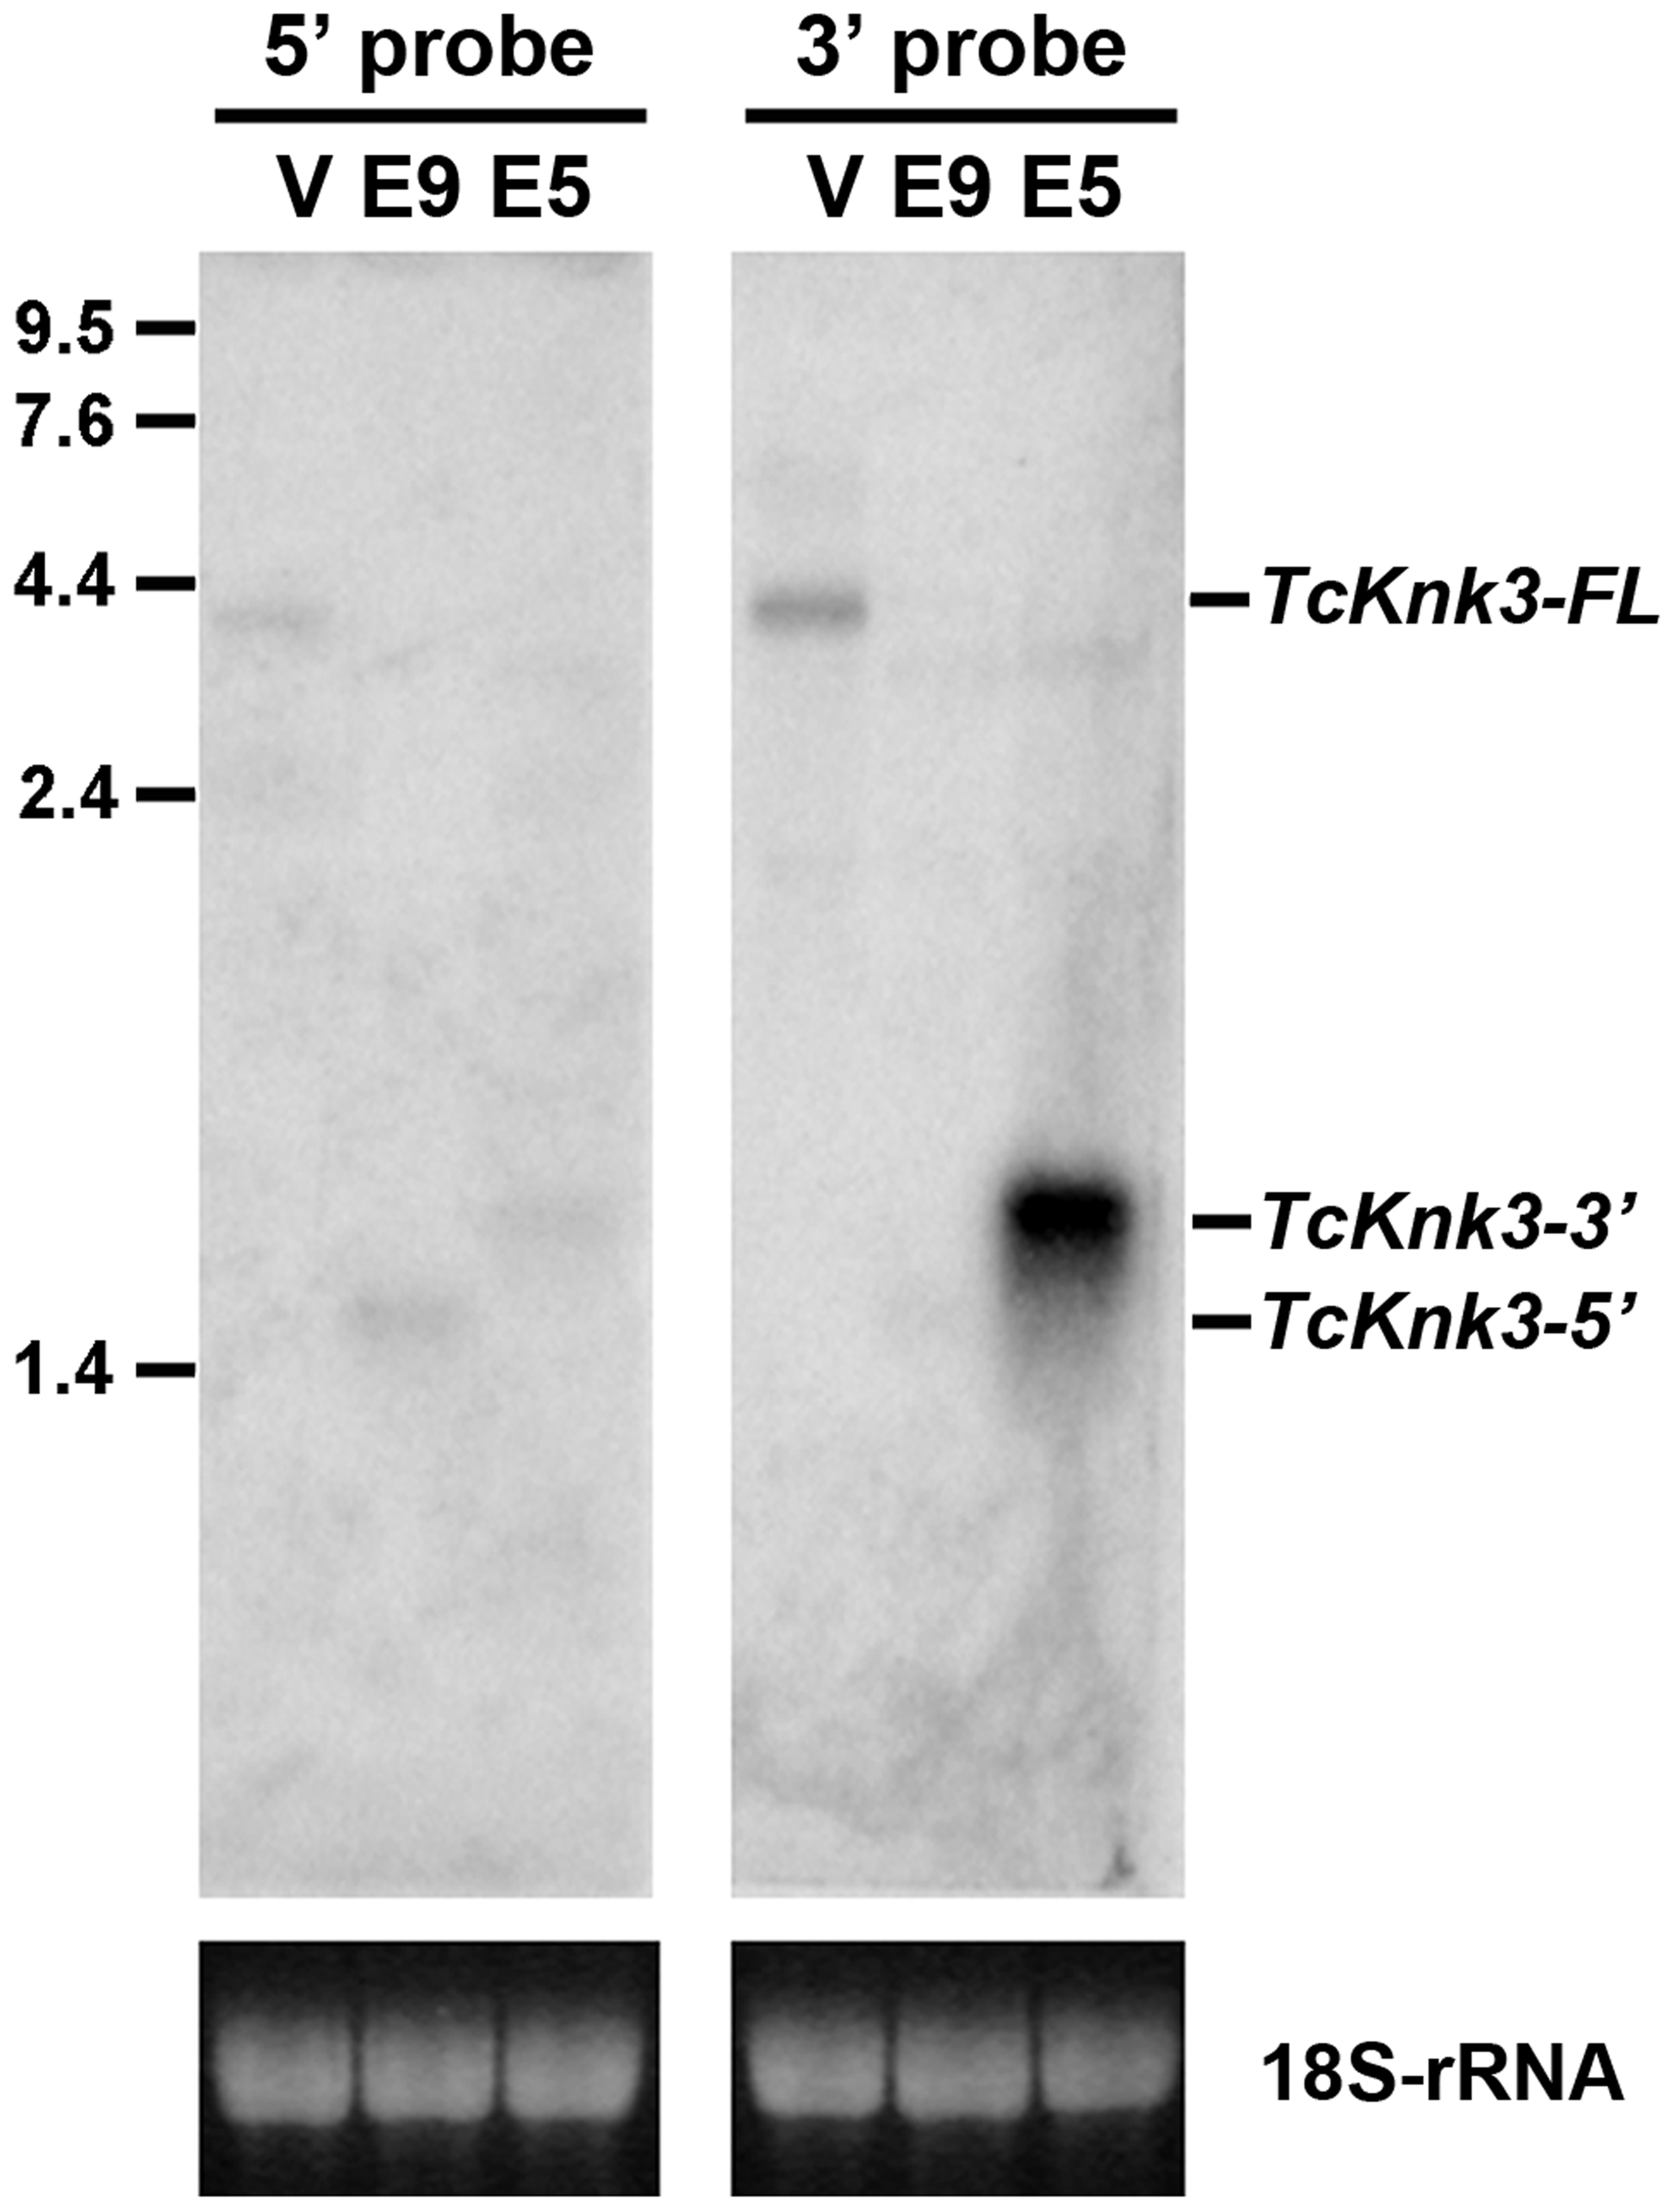 Northern blot analysis of <i>TcKnk3</i> transcripts using <sup>32</sup>P-labeled 5′-terminal and 3′-terminal probes.